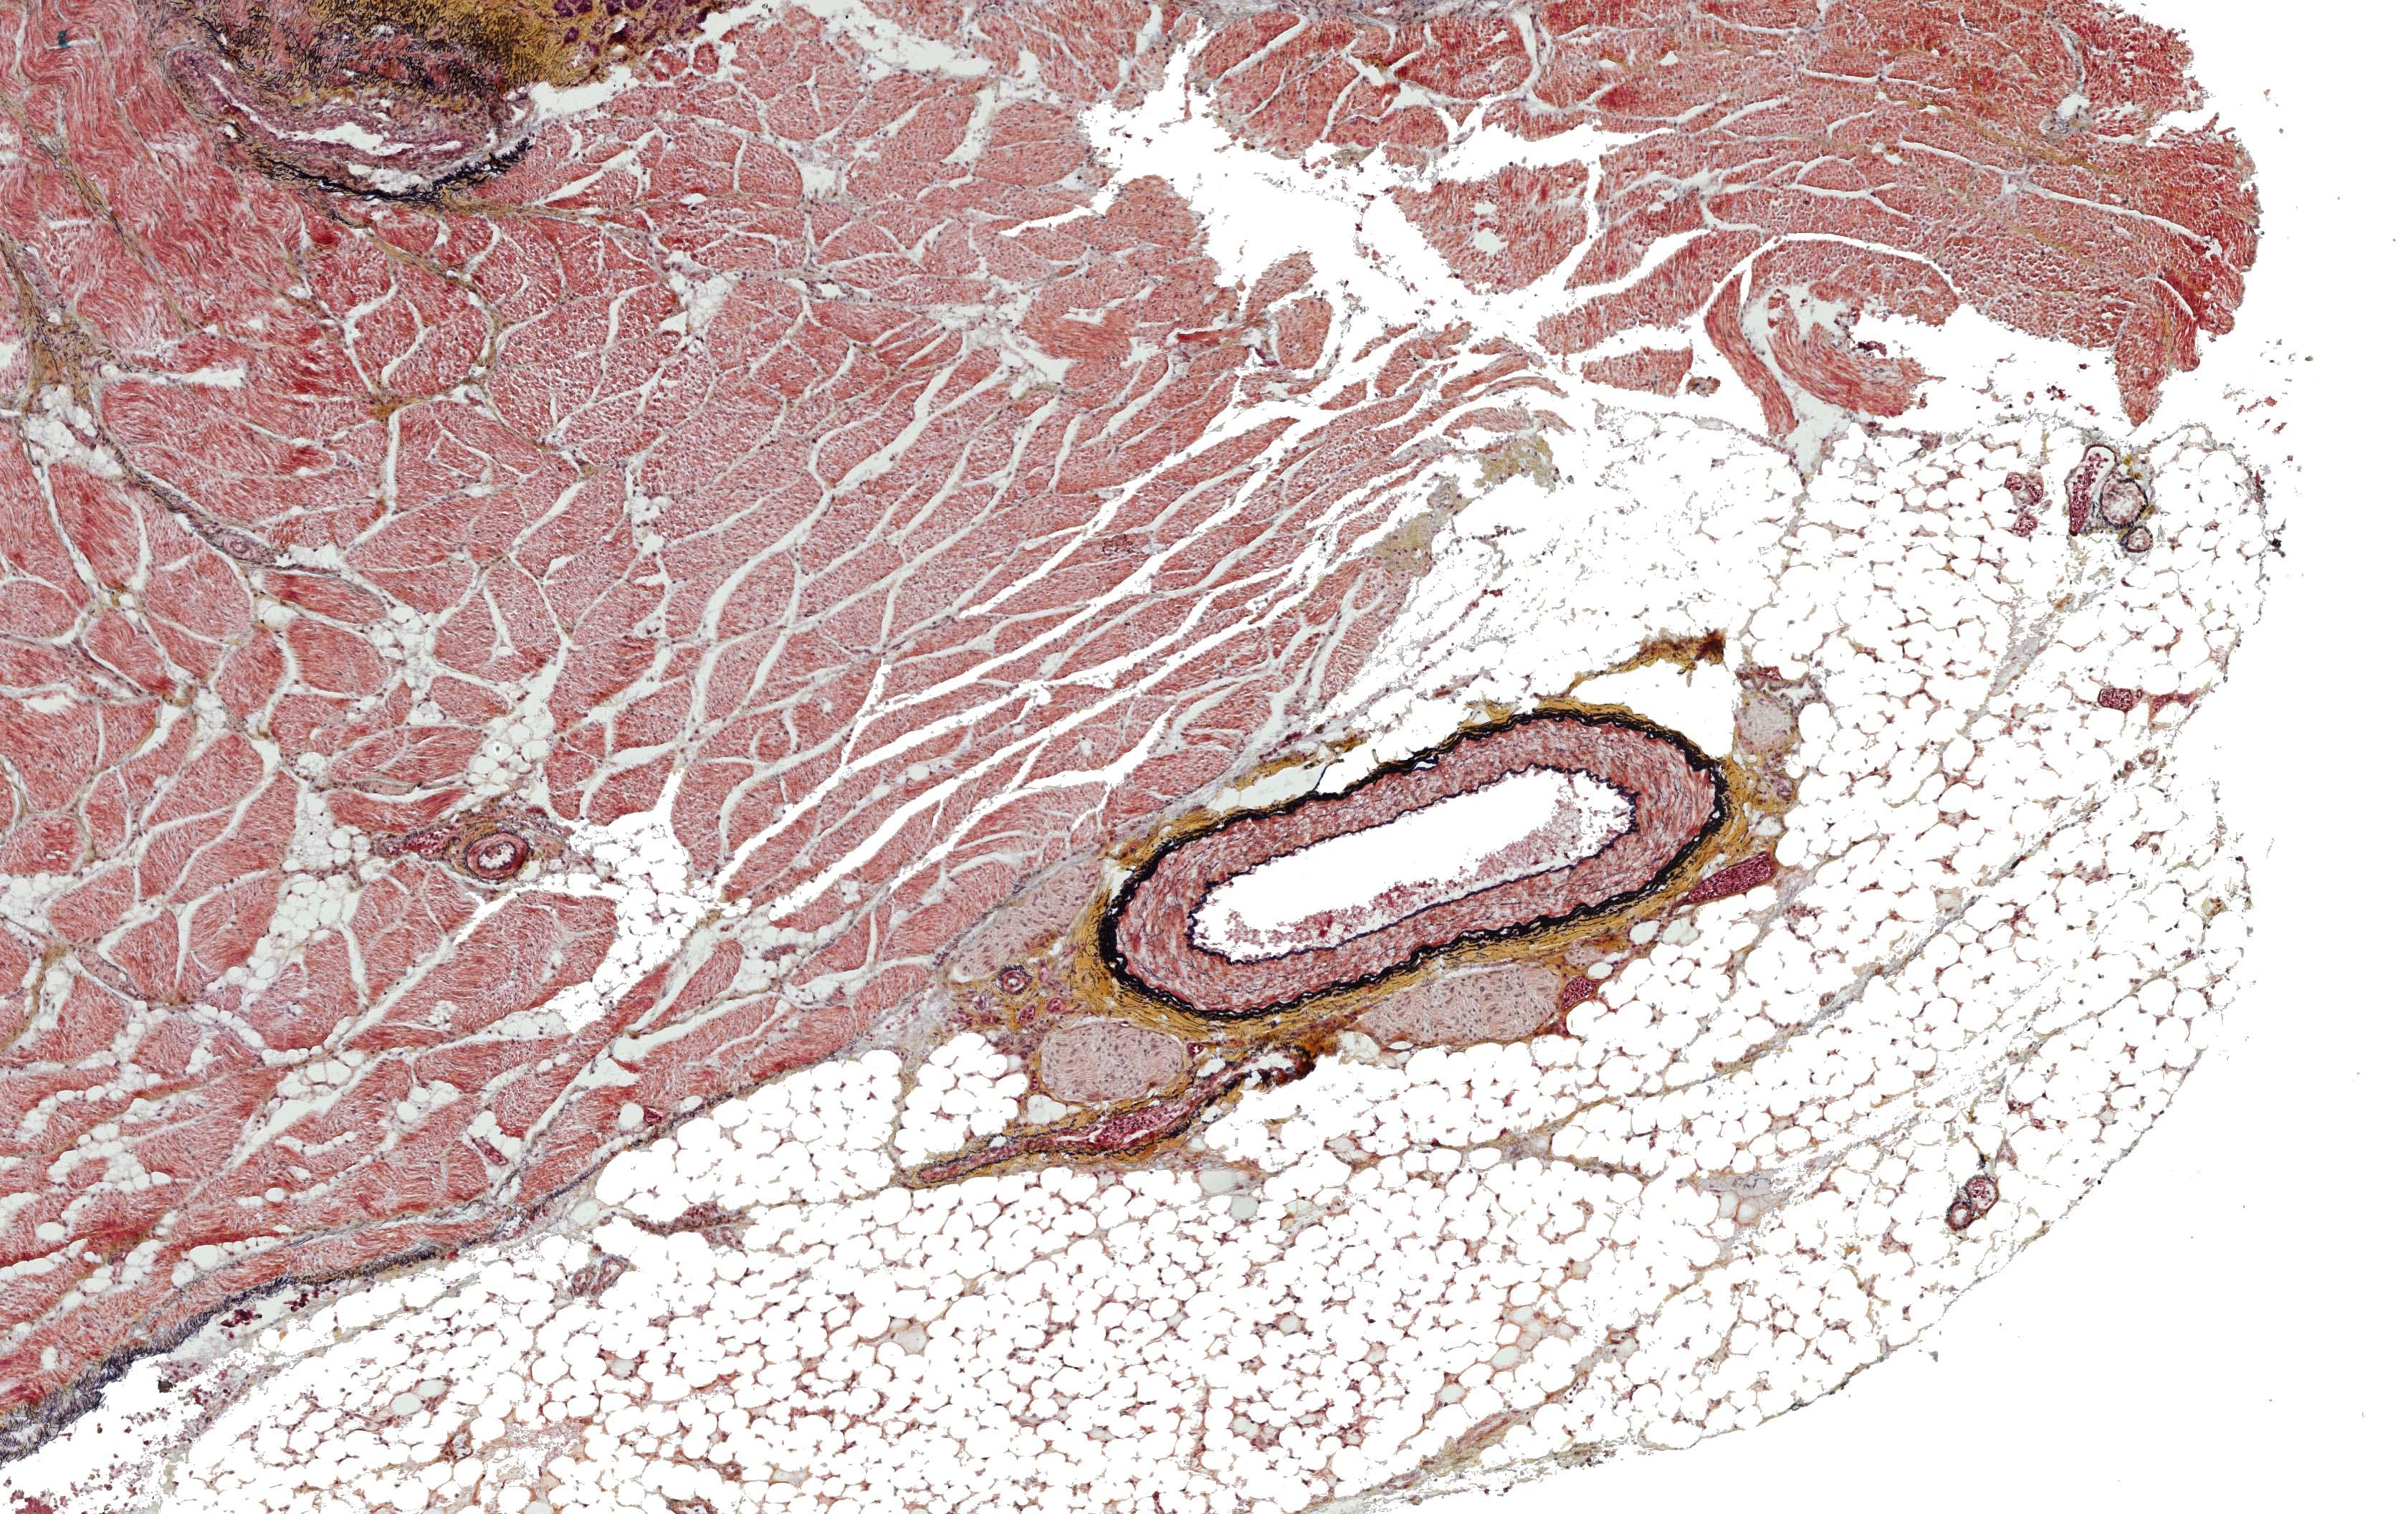 ALTHISIA movat pentachrome 8